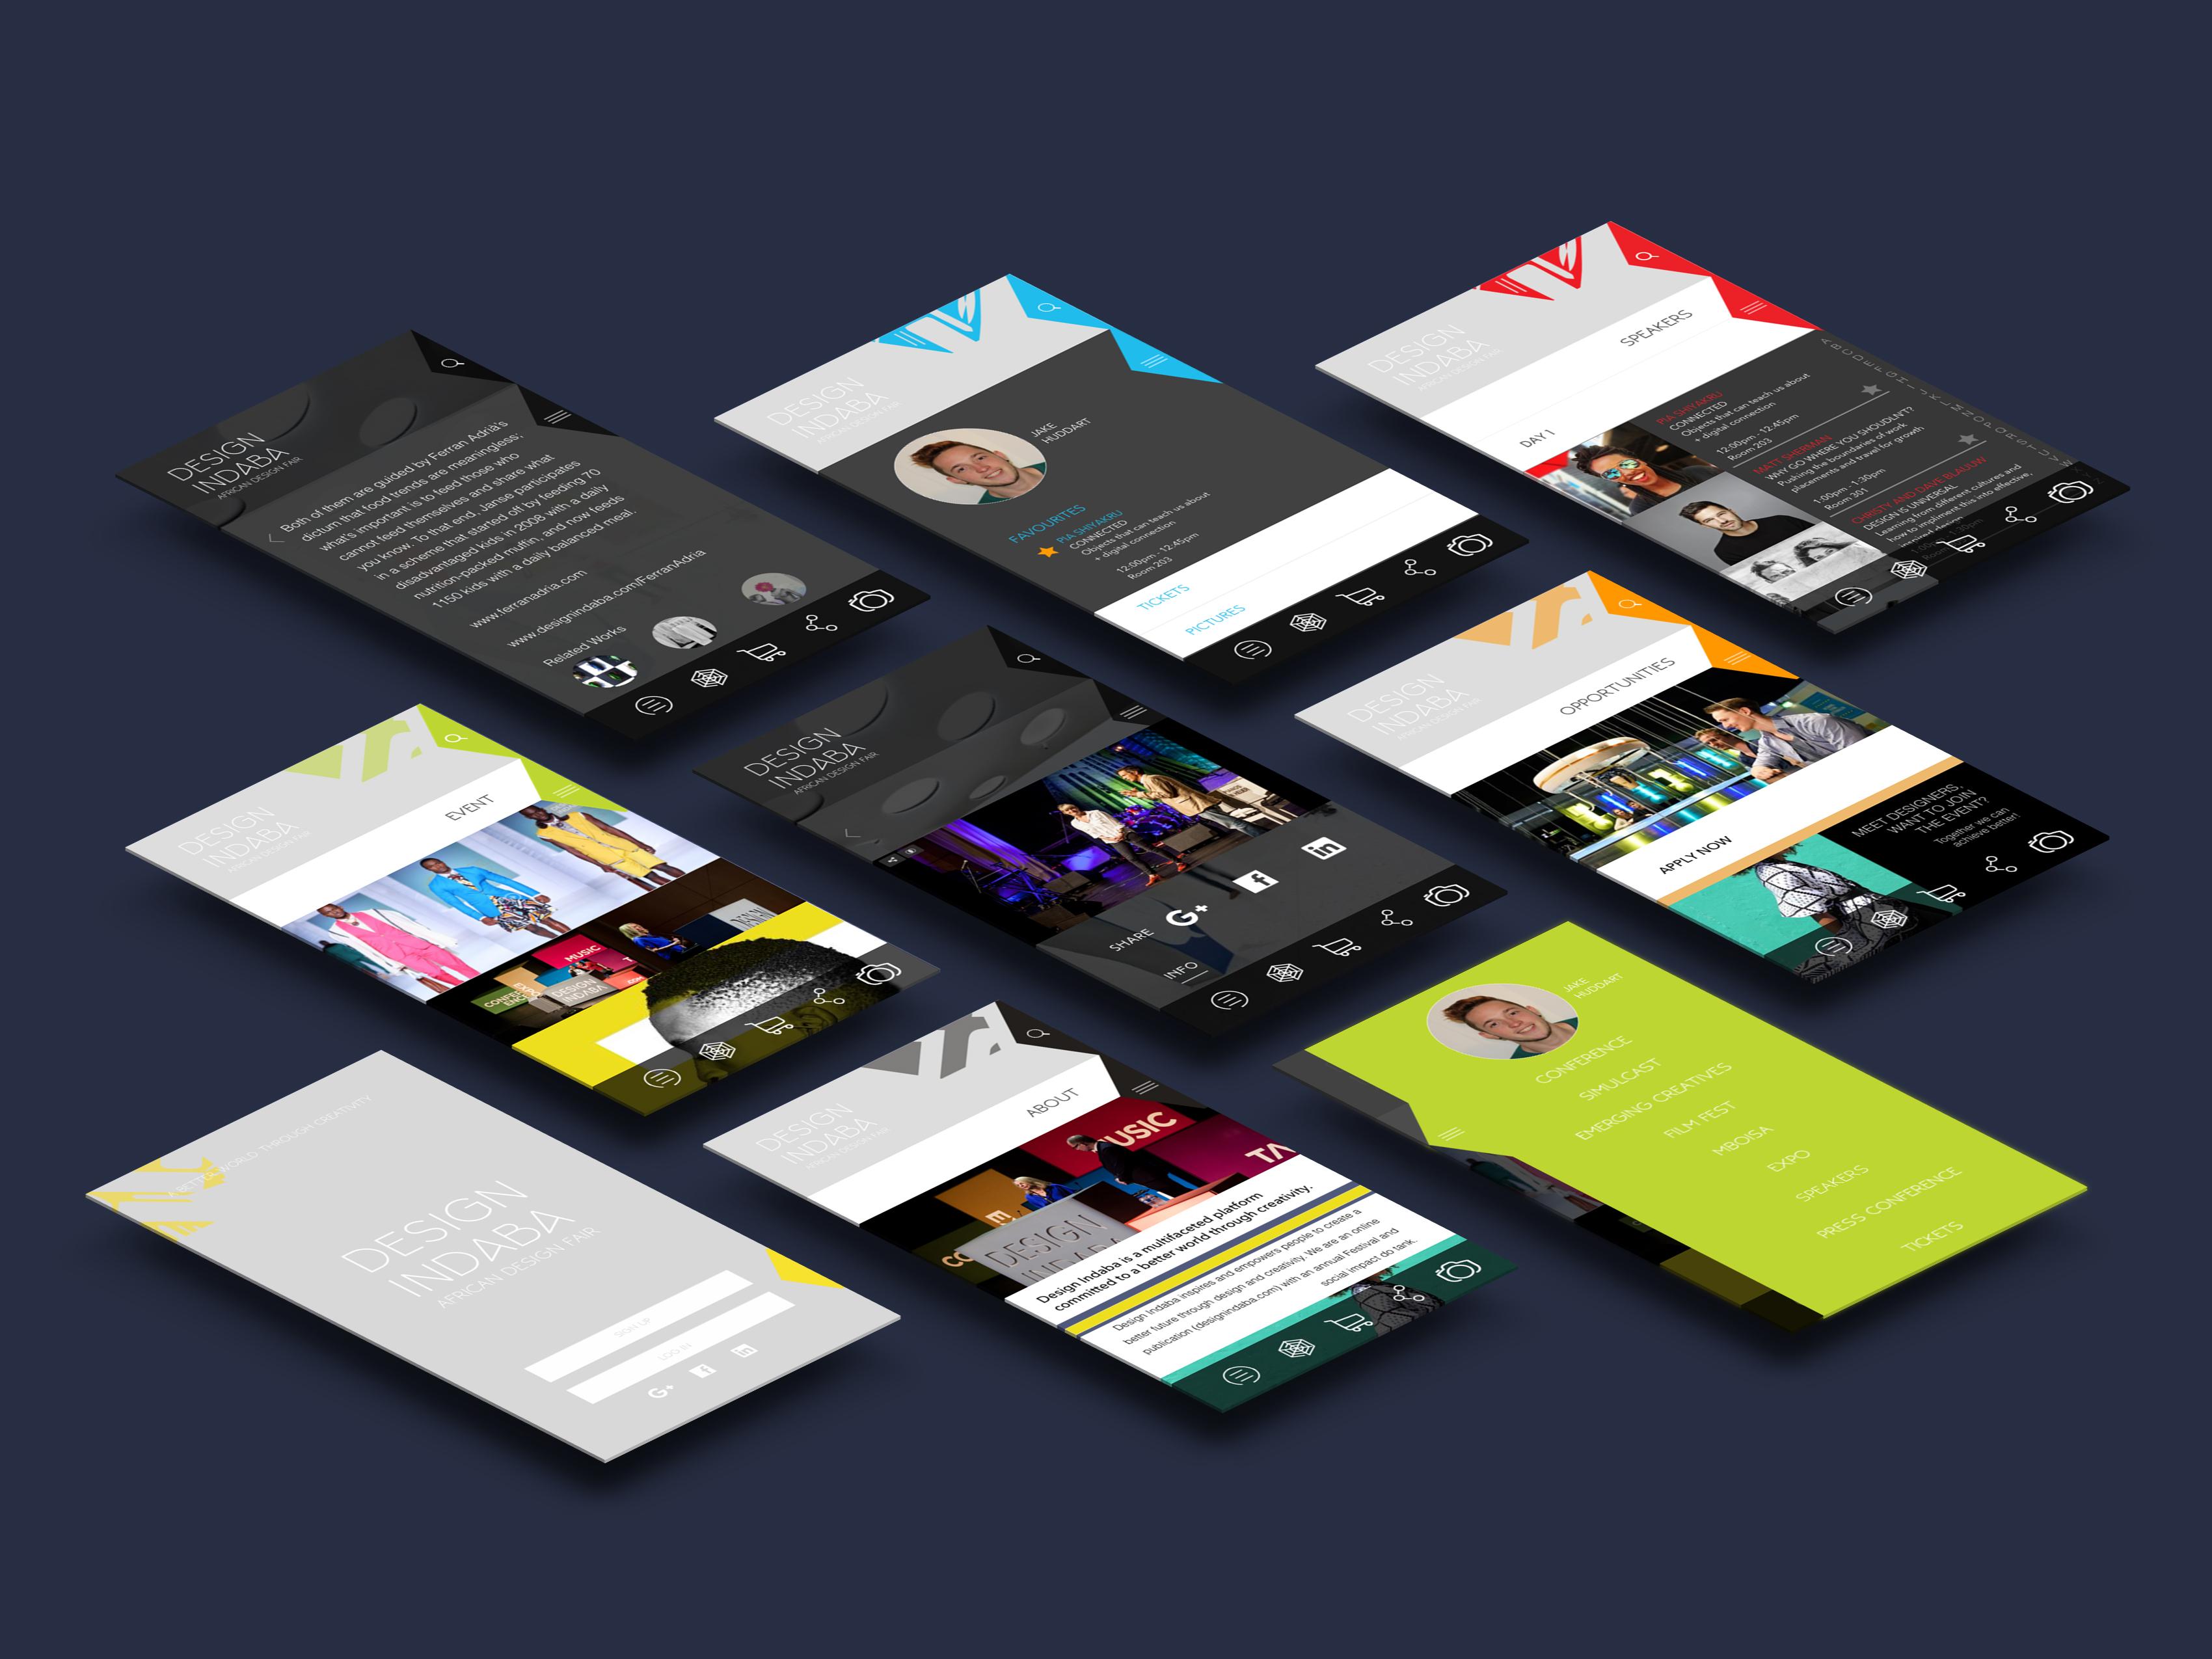 Design Indaba app